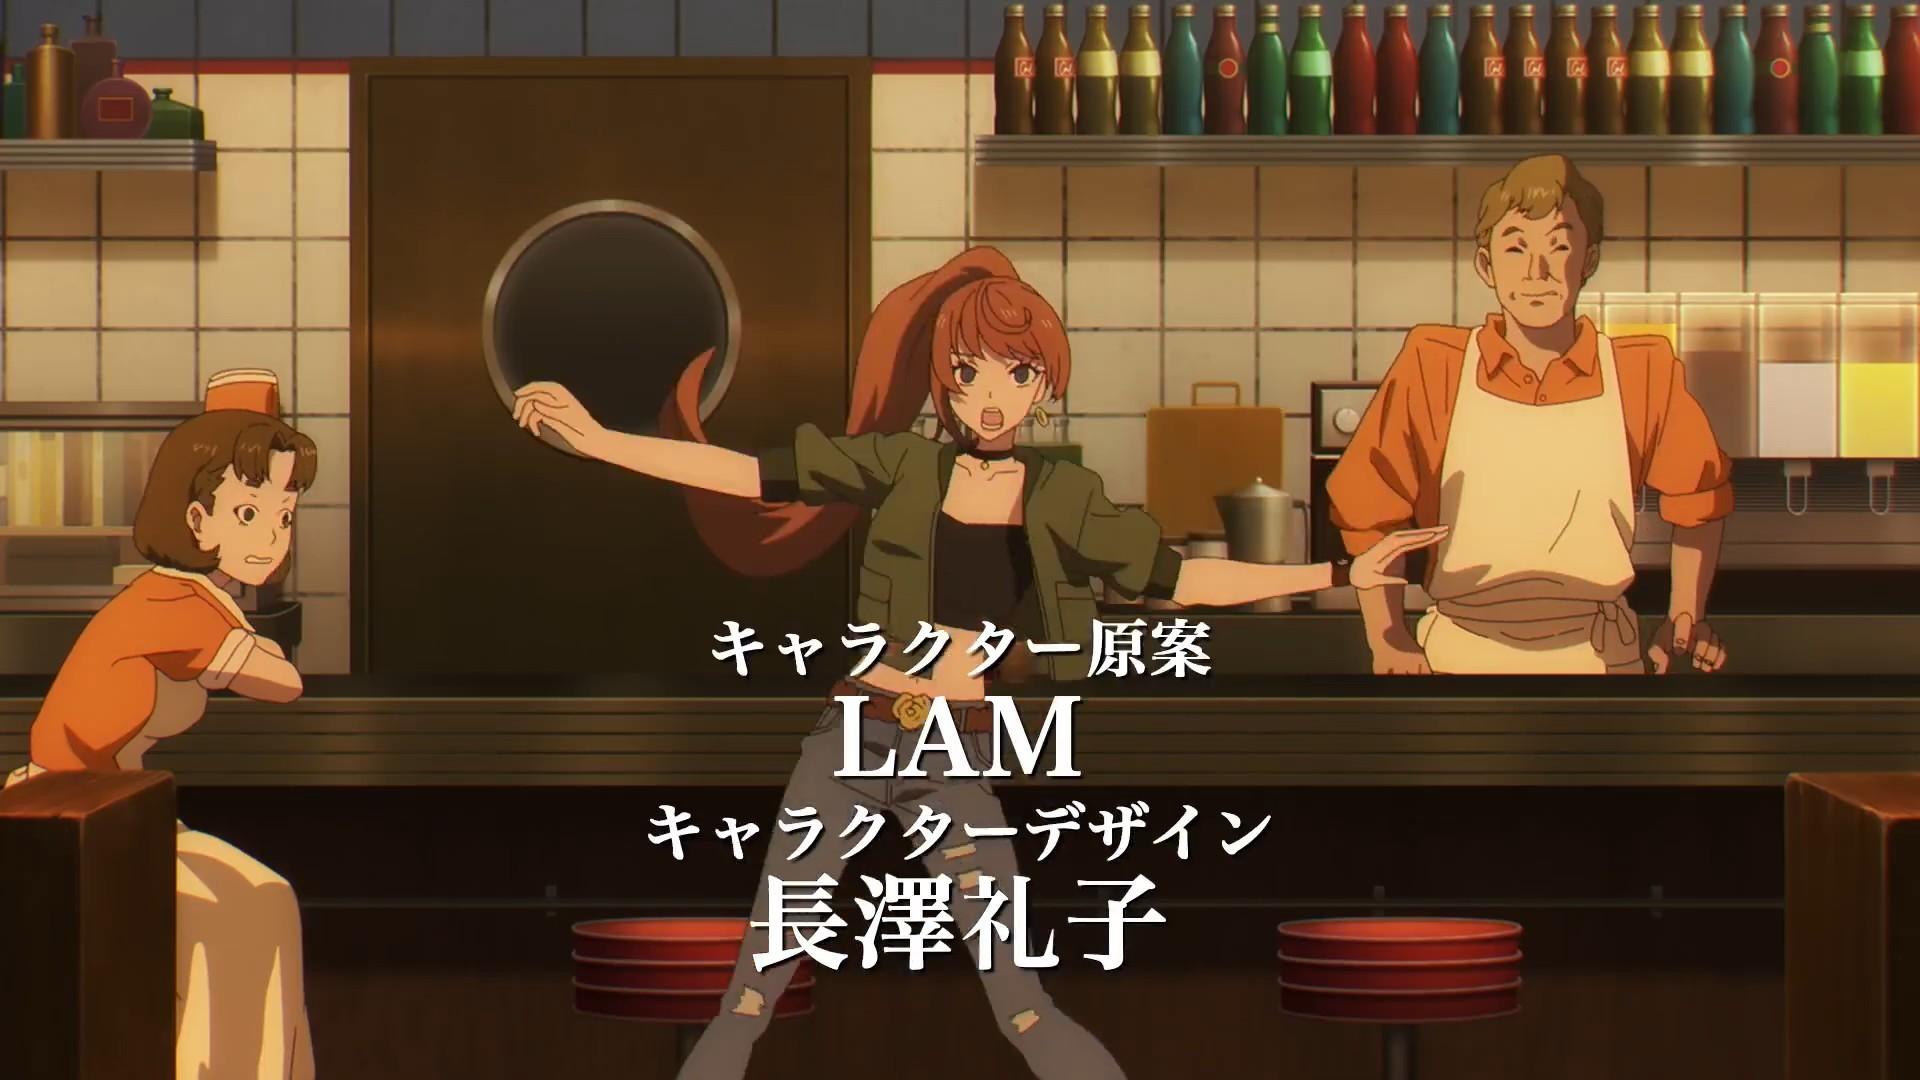 MAPPA×疯房子出品 ,TV动画《takt op.Destiny》PV2公开,10月5日开播- ACG17.COM